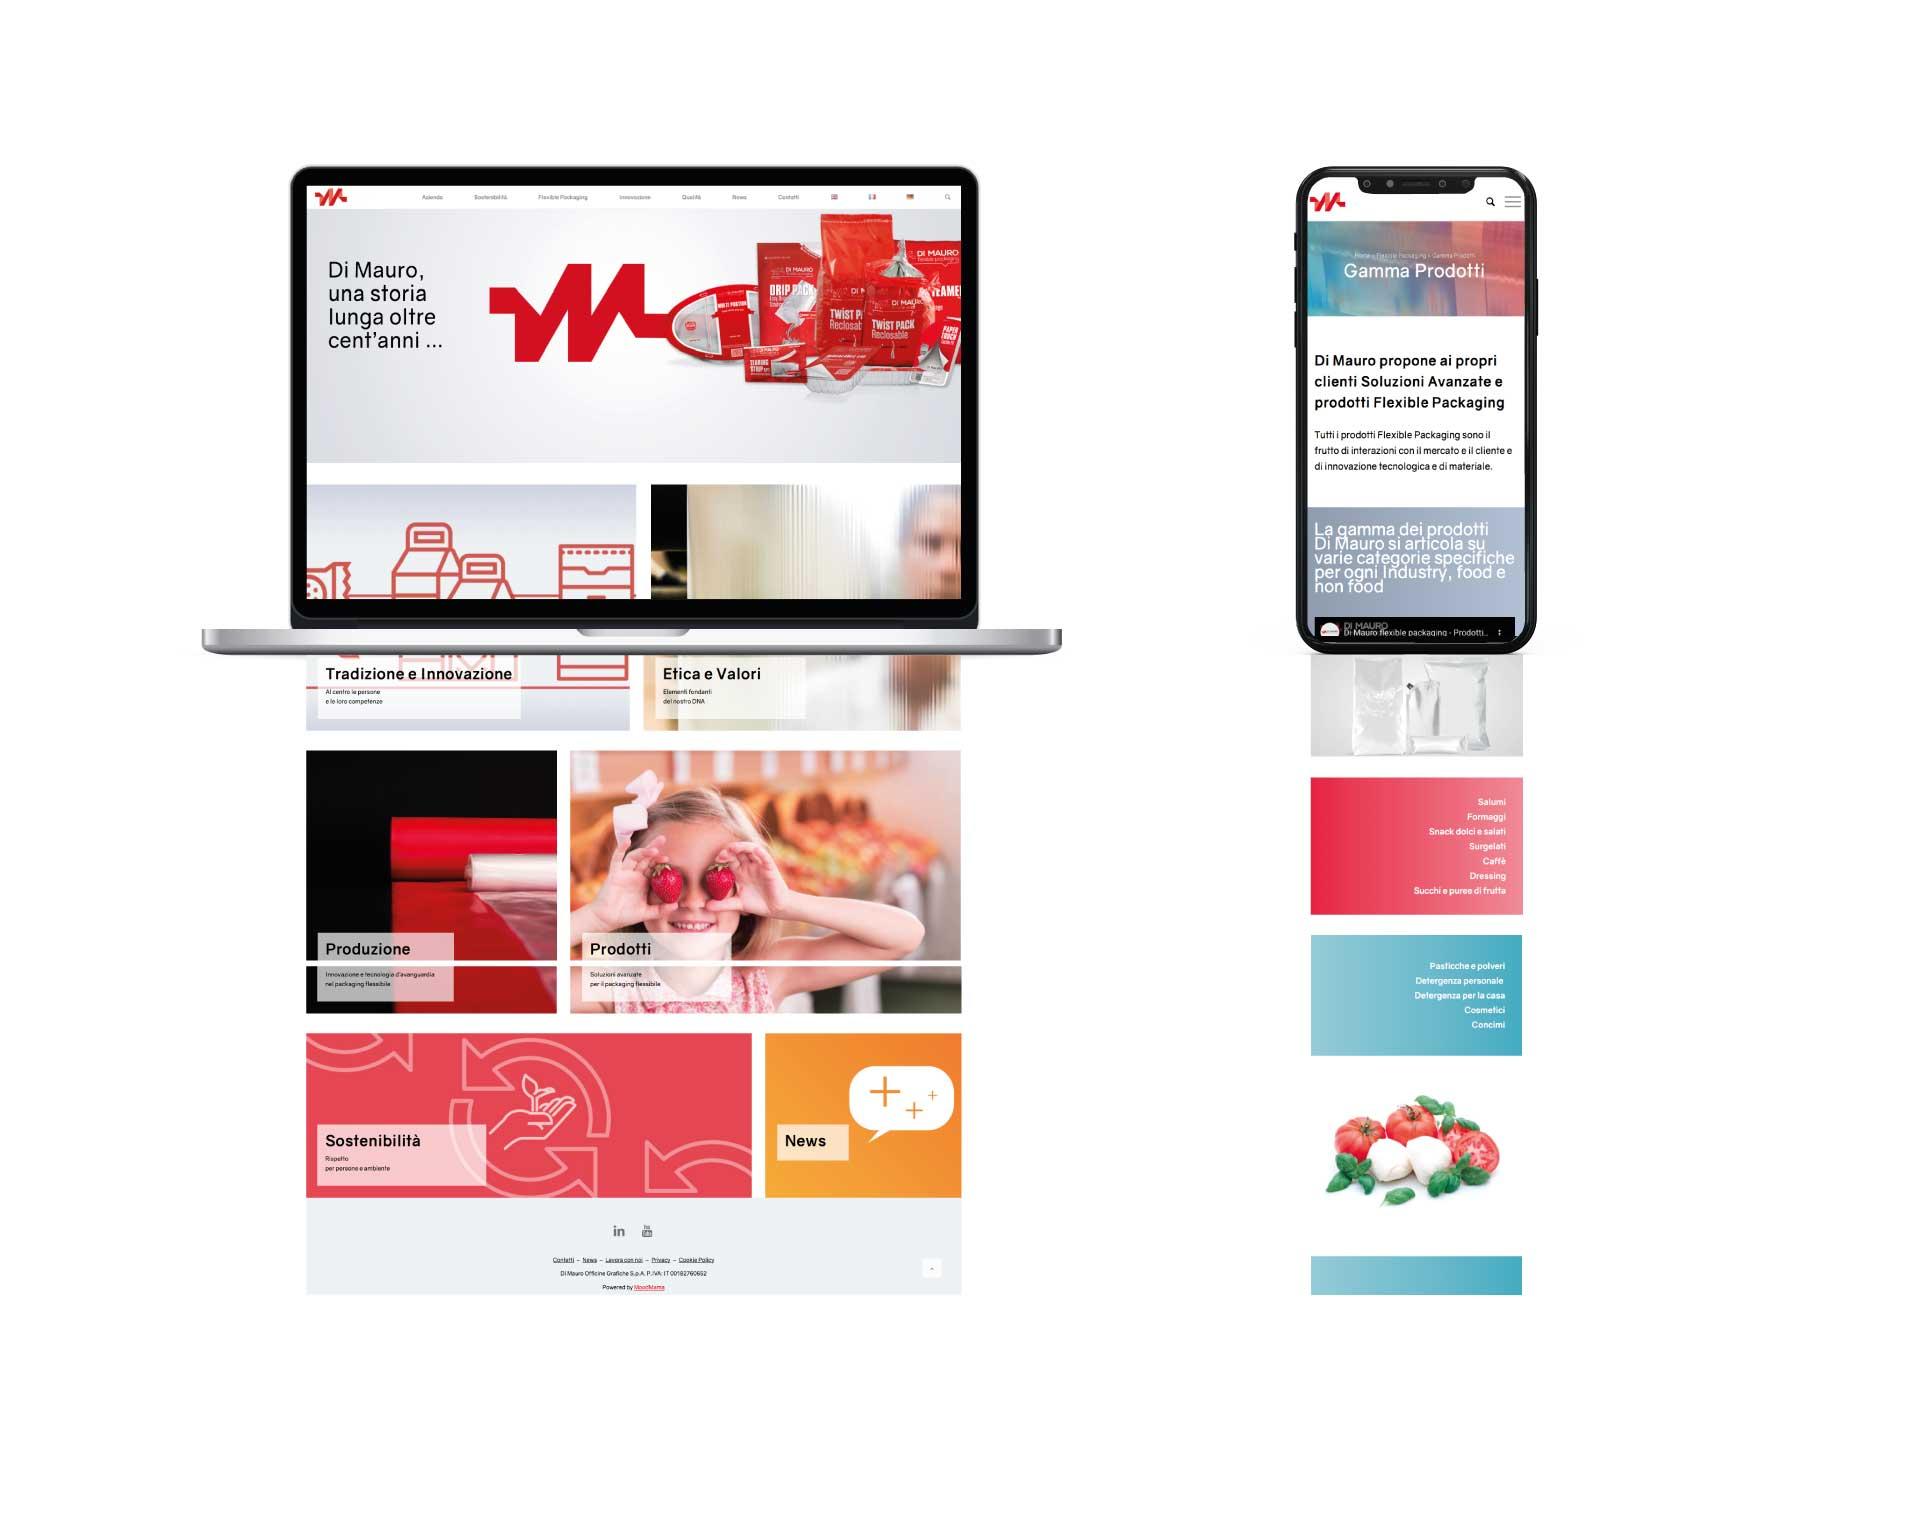 di mauro moodmama lavori work website home desktop